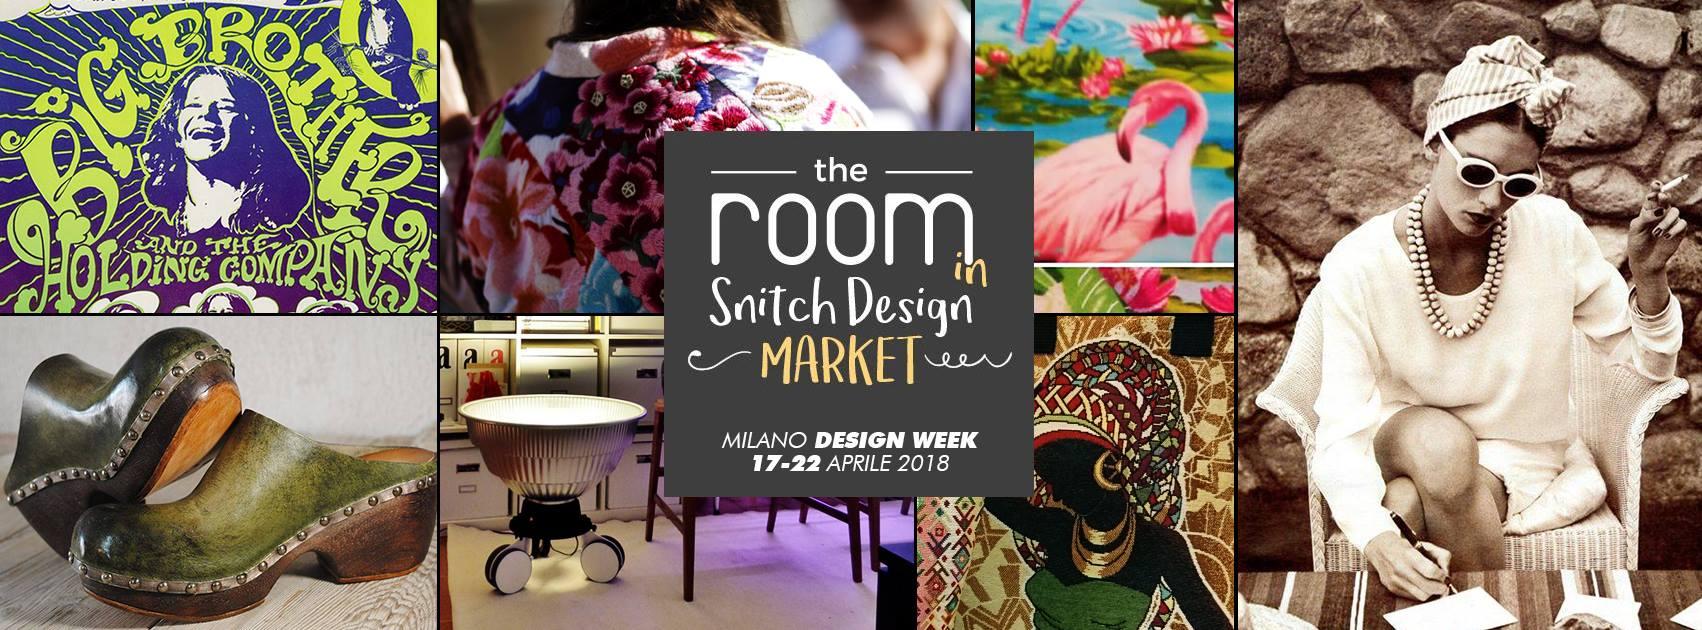 Snitch Design Market 2018 milano design week party